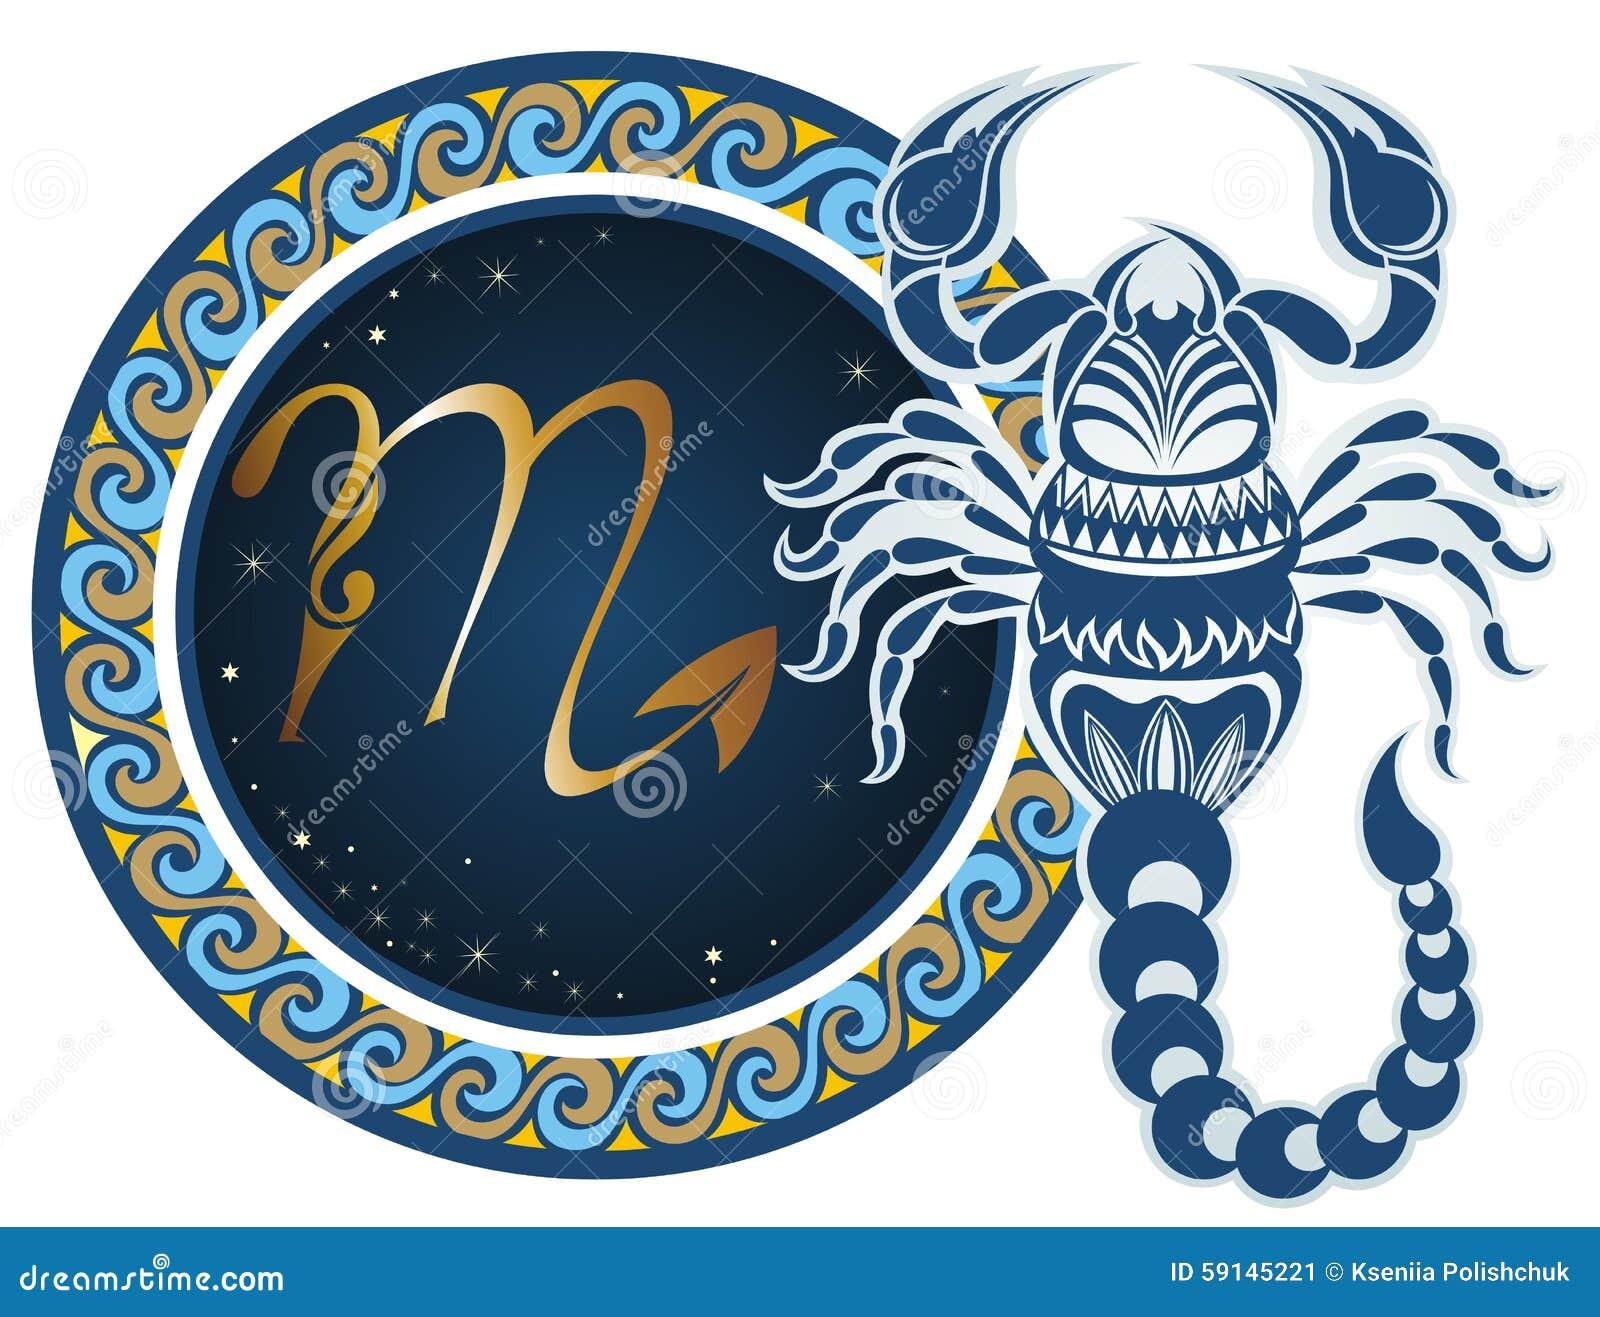 Zodiac Signs Scorpio Tattoo Designs